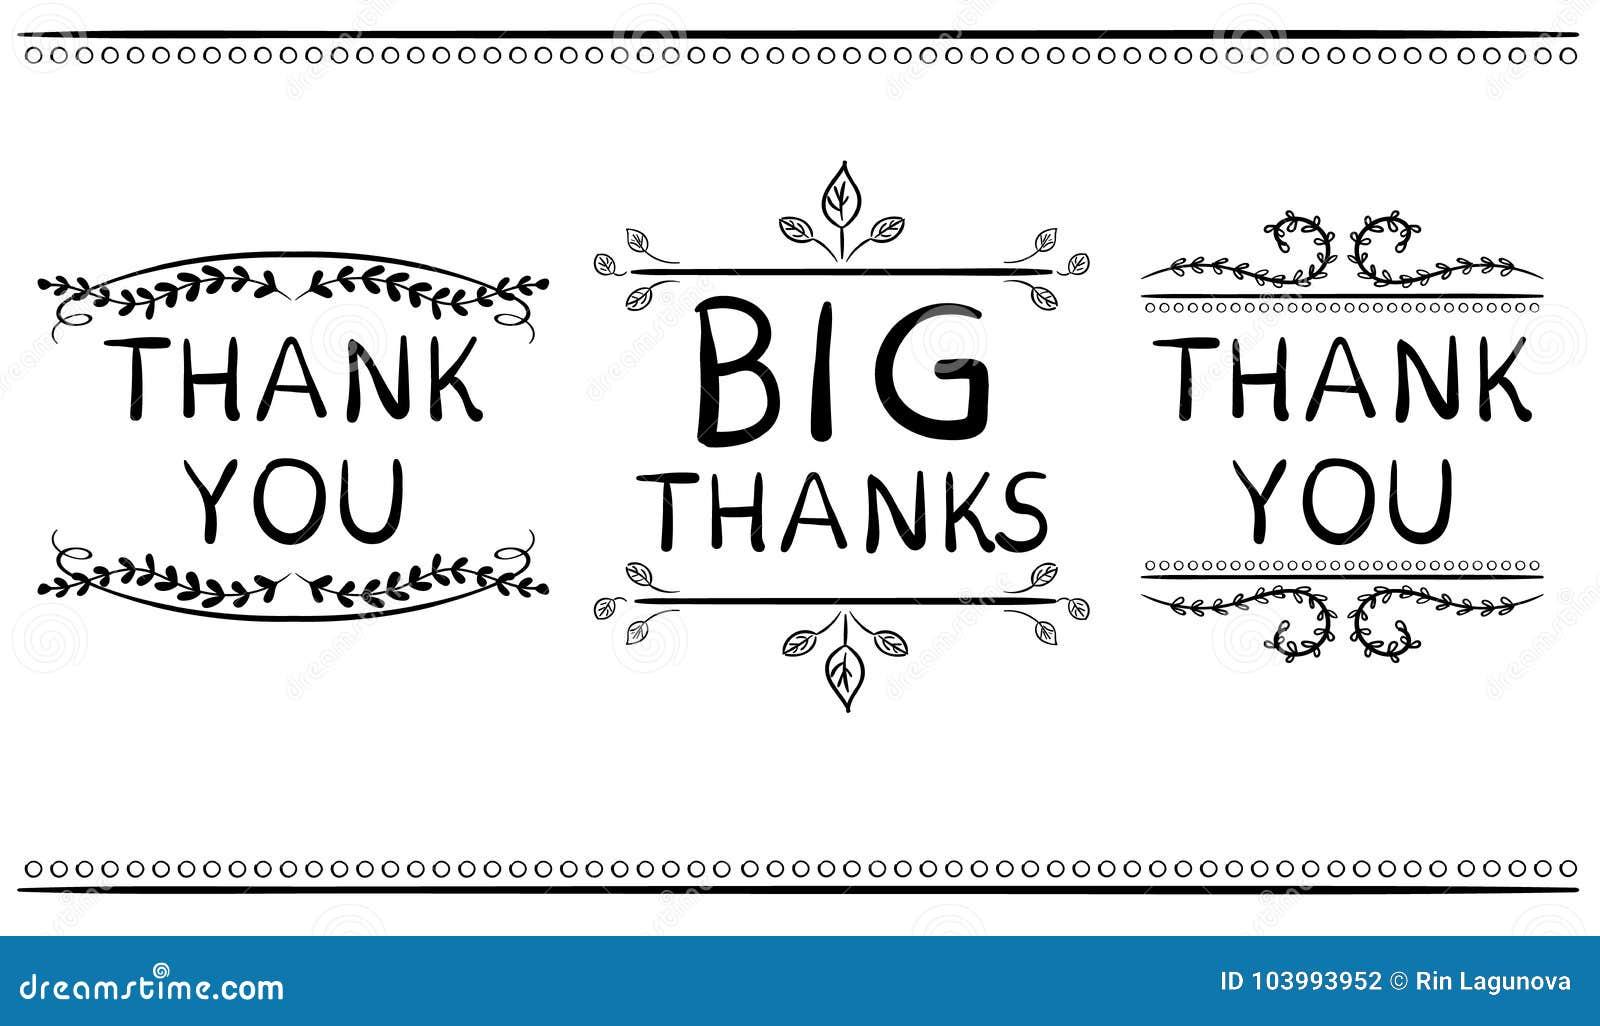 Thank You Card Template | Thank You Card Templates Big Thanks Vector Handwritten Words With